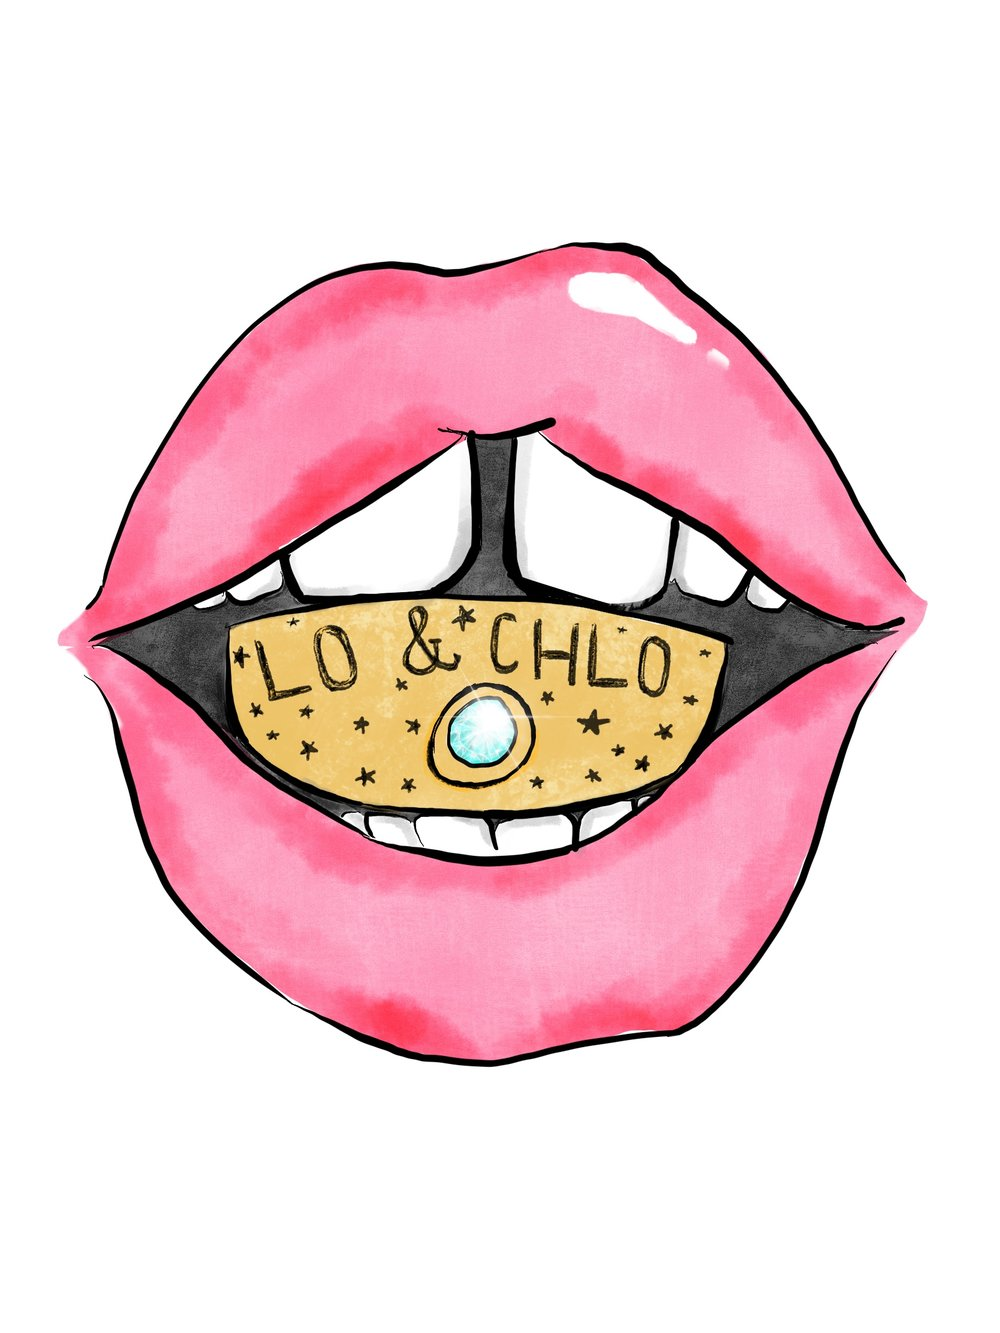 lo & chlo lips